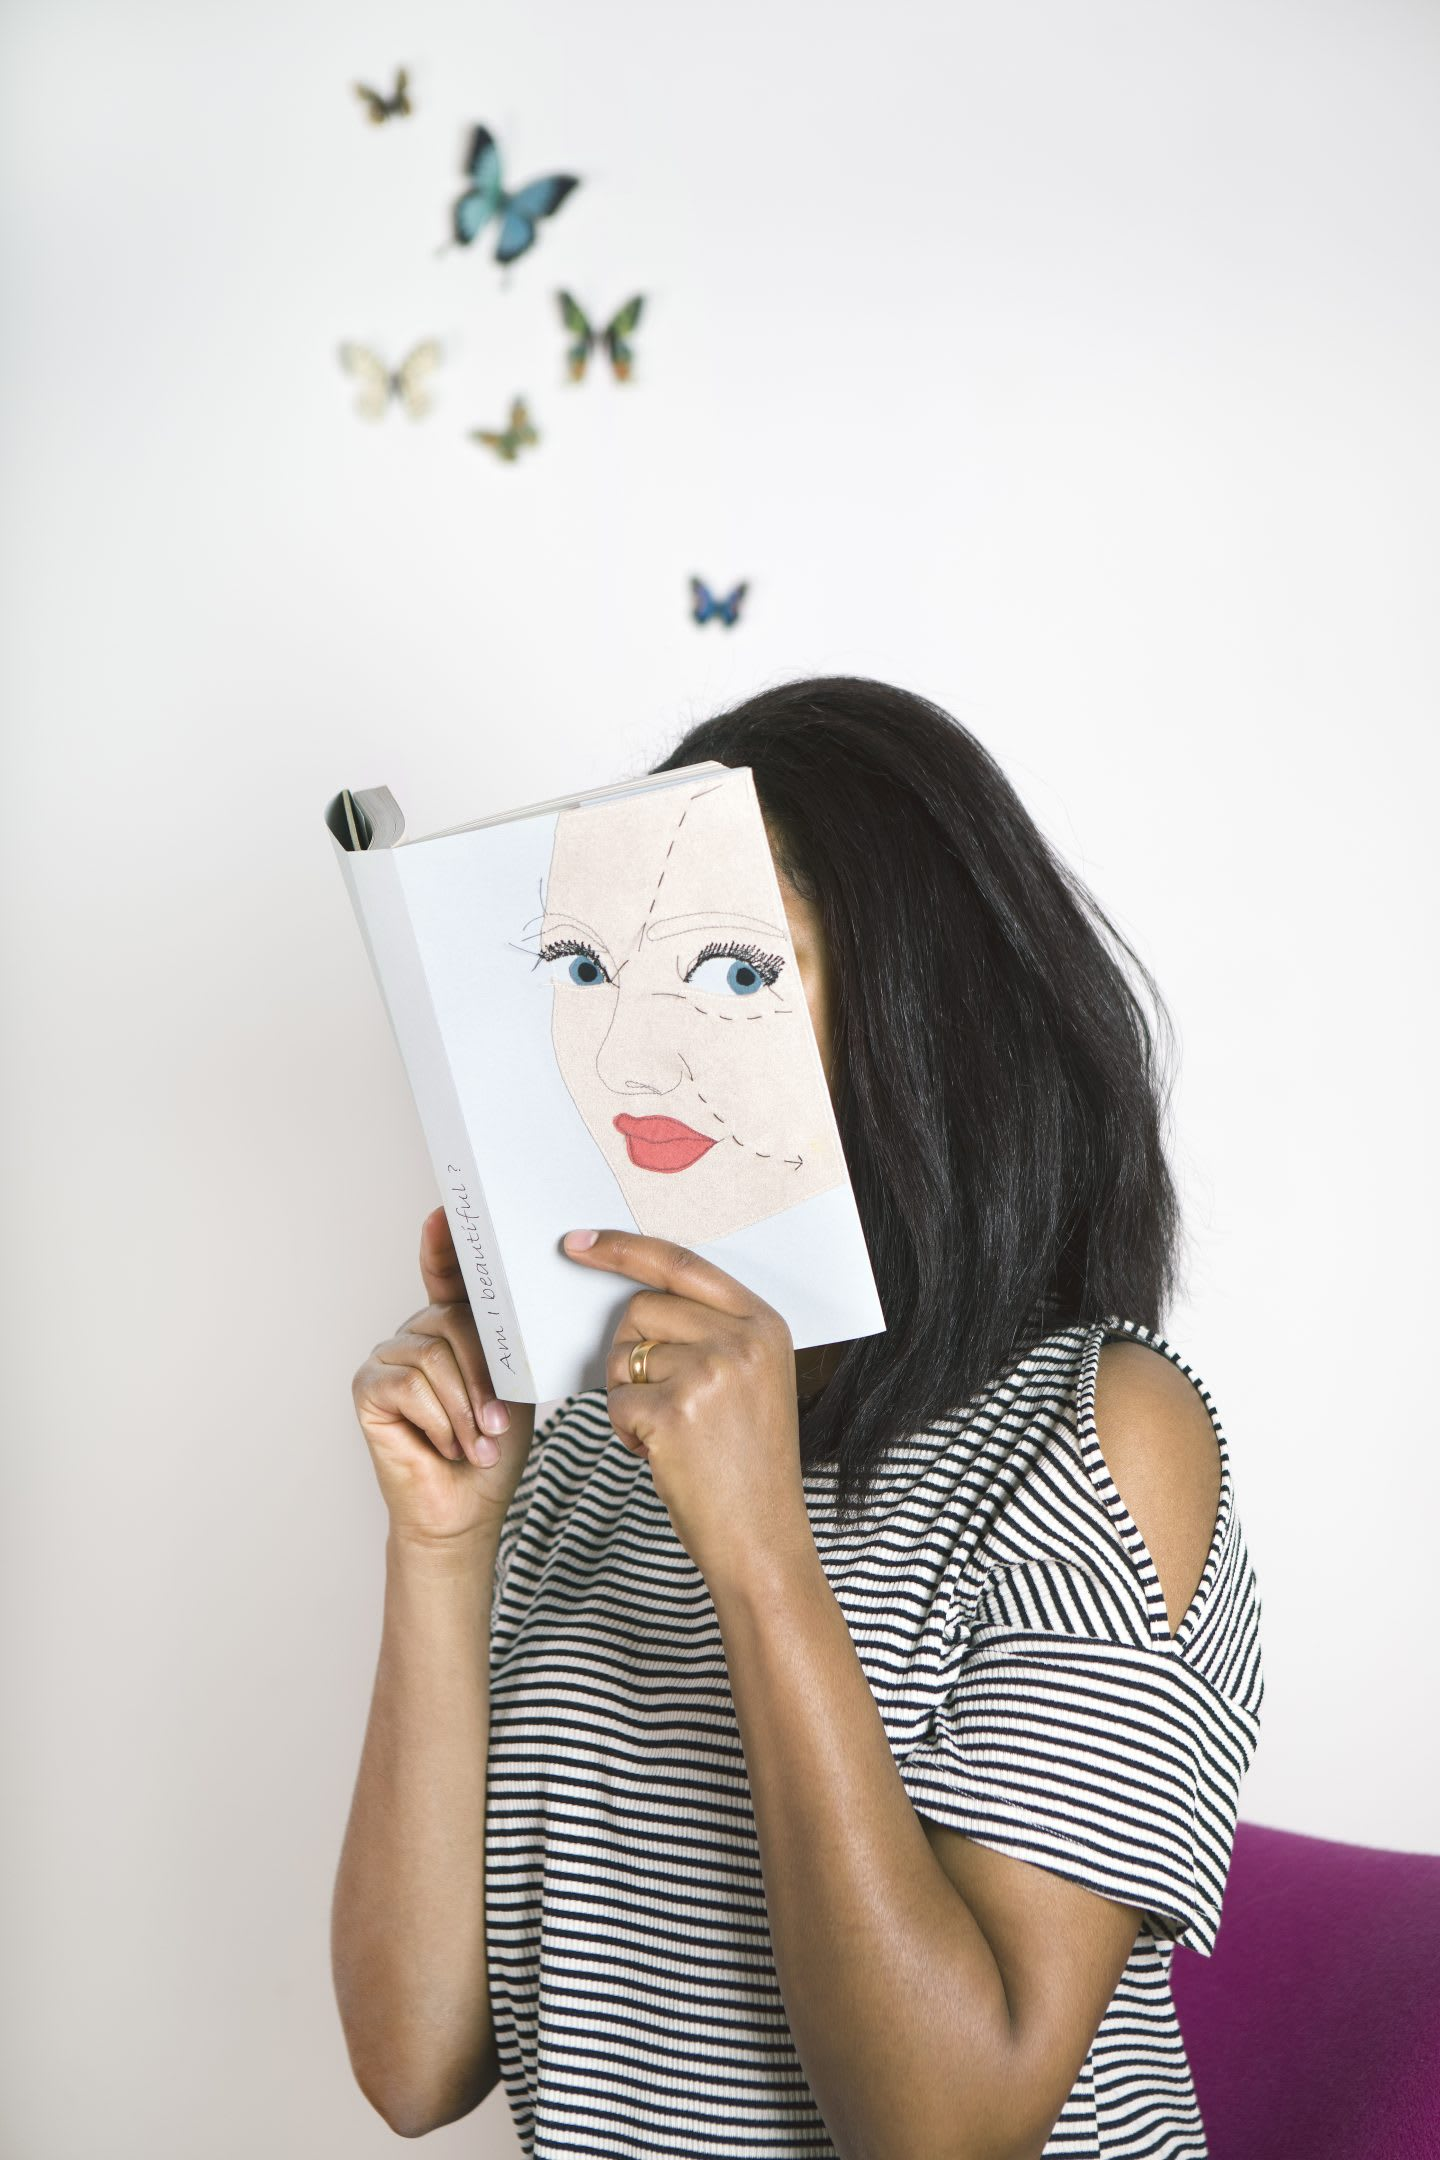 Woman wearing a stripy shirt reading a book with face hidden, imagination, butterflies, thinking, creative, personal, rest, inspiration, GamePlan A